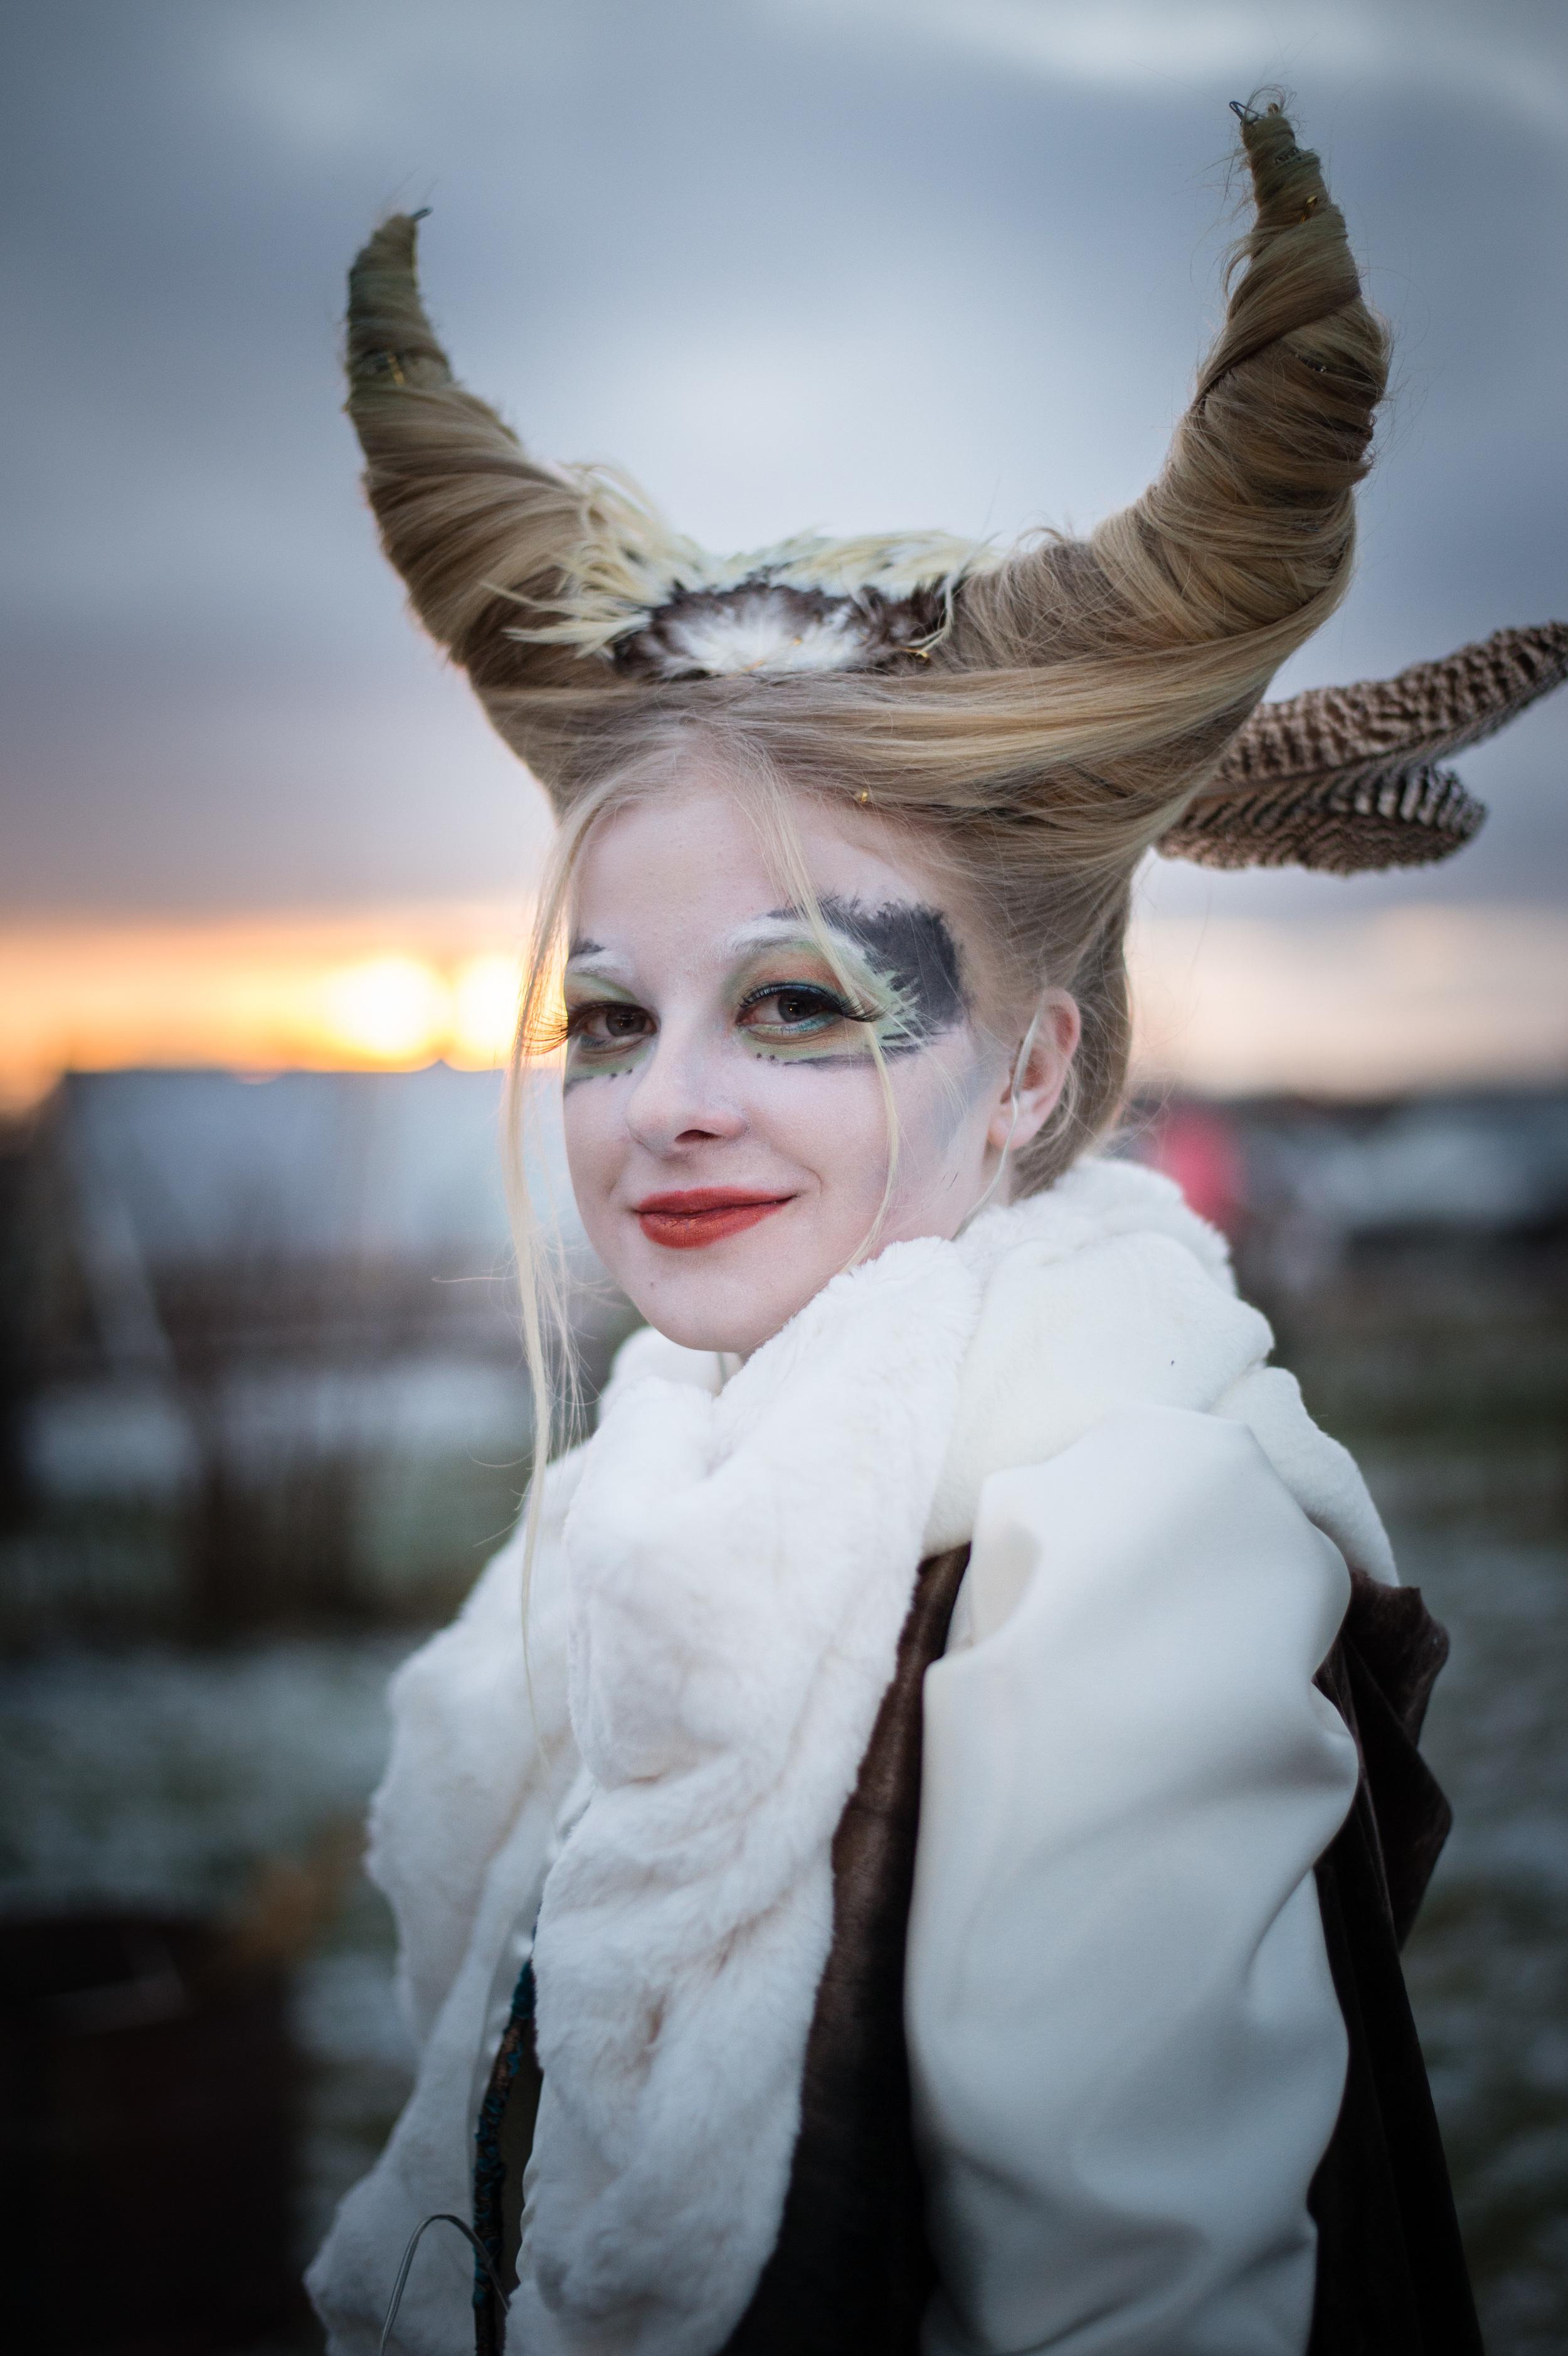 Tävlingsdeltagare i Midvinterglöds Makeup & Kostym-tävling 2014 med tema Vinterväsen. Foto:  Philippe Rendu